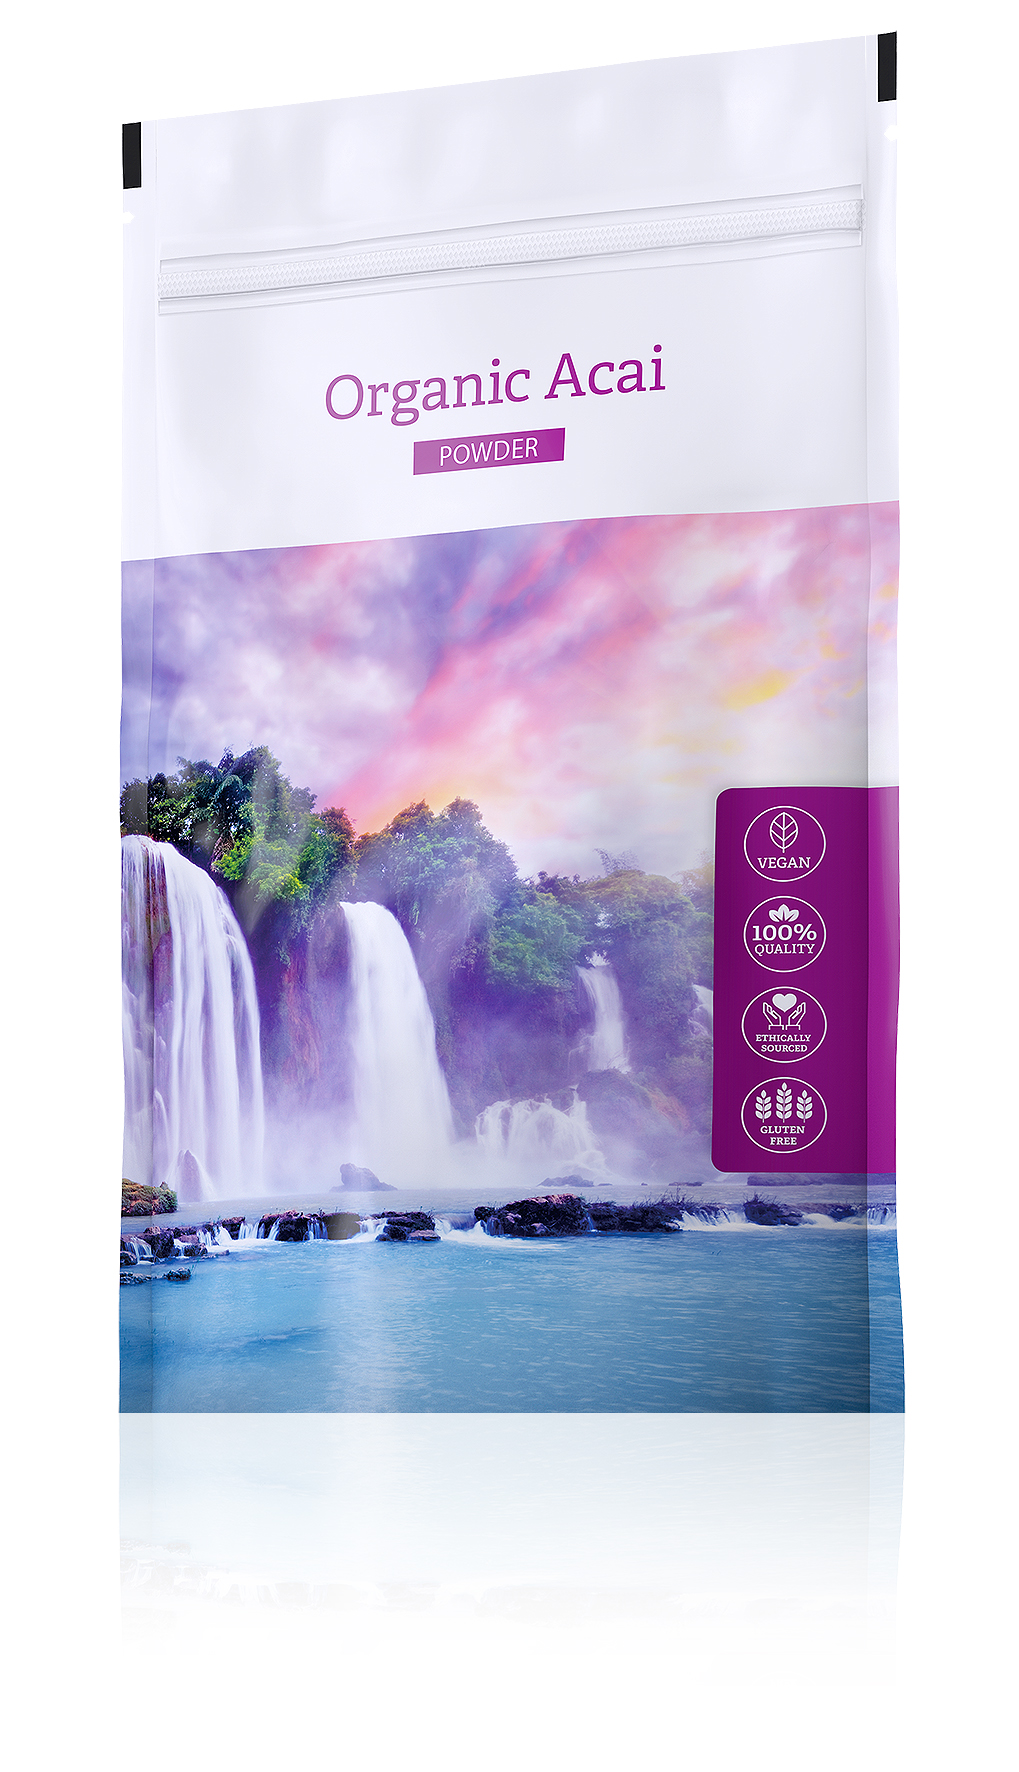 Zelené potraviny, přírodní kosmetika Energy - prodej, eshop